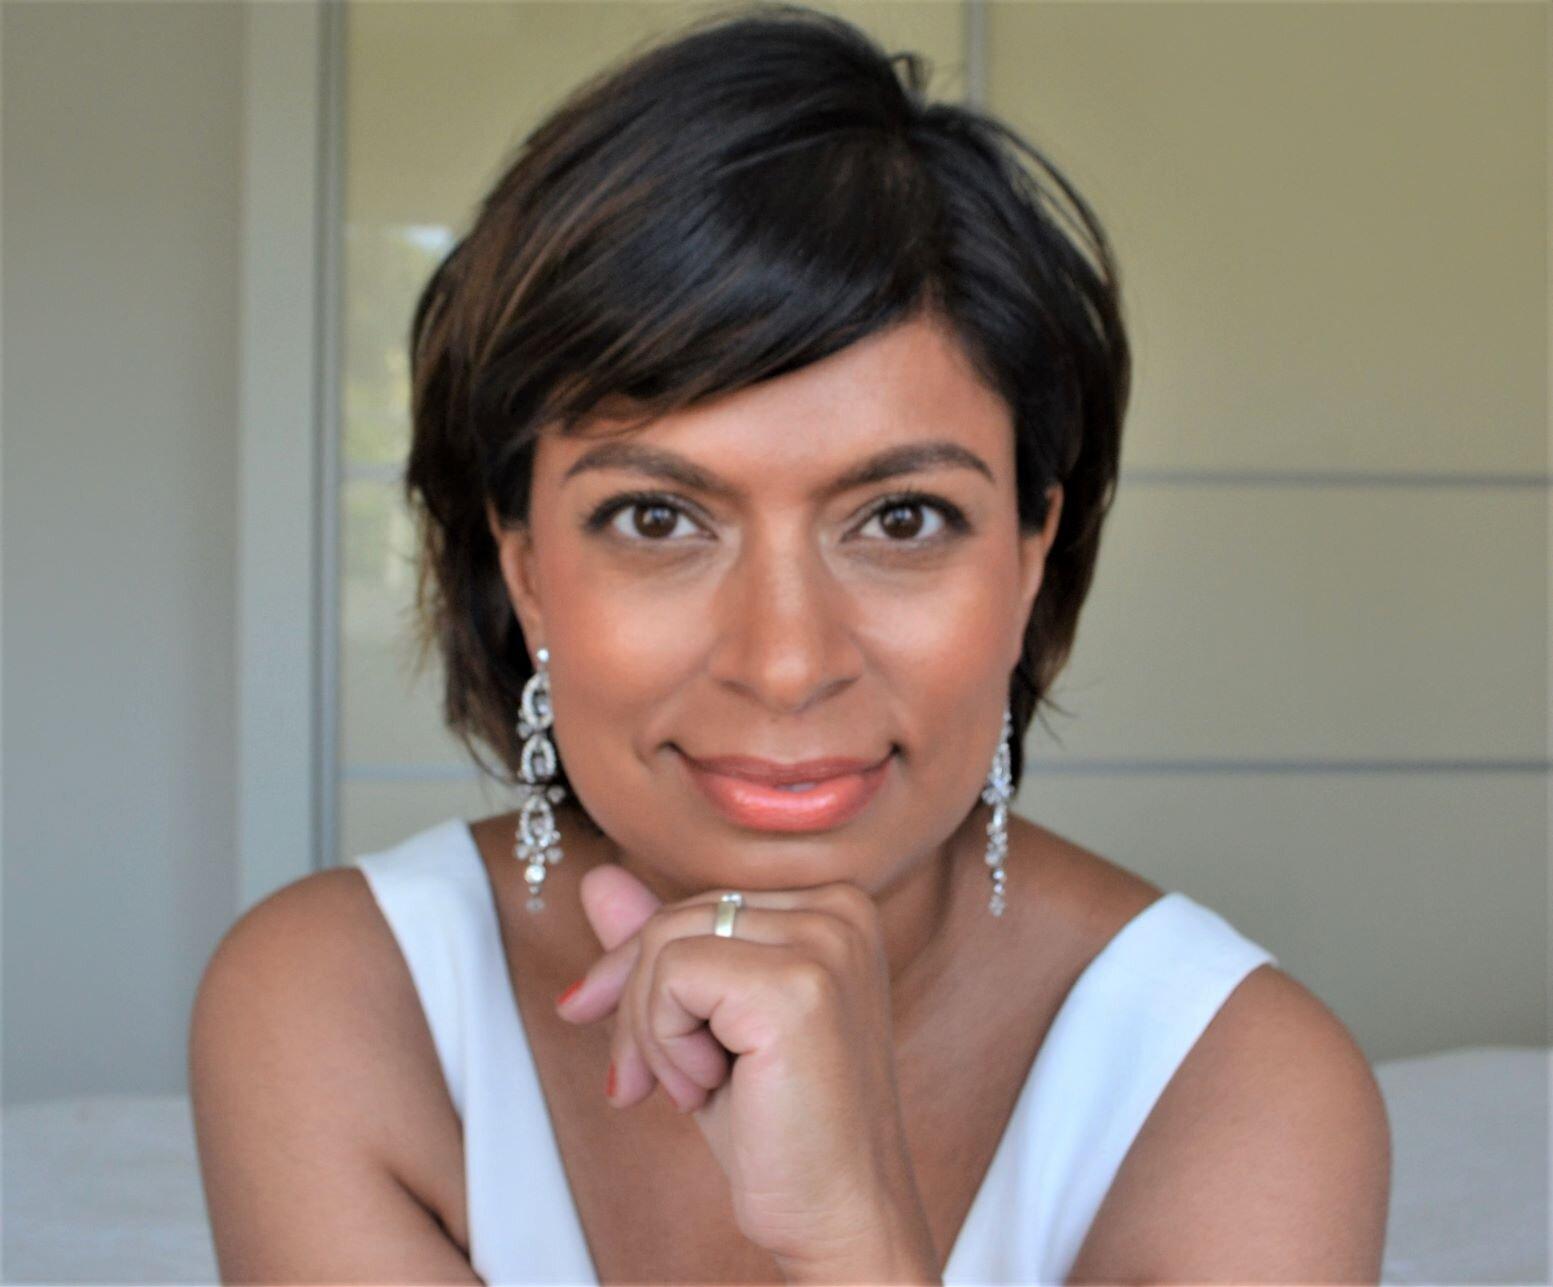 Afreen age 45 (same earrings!)